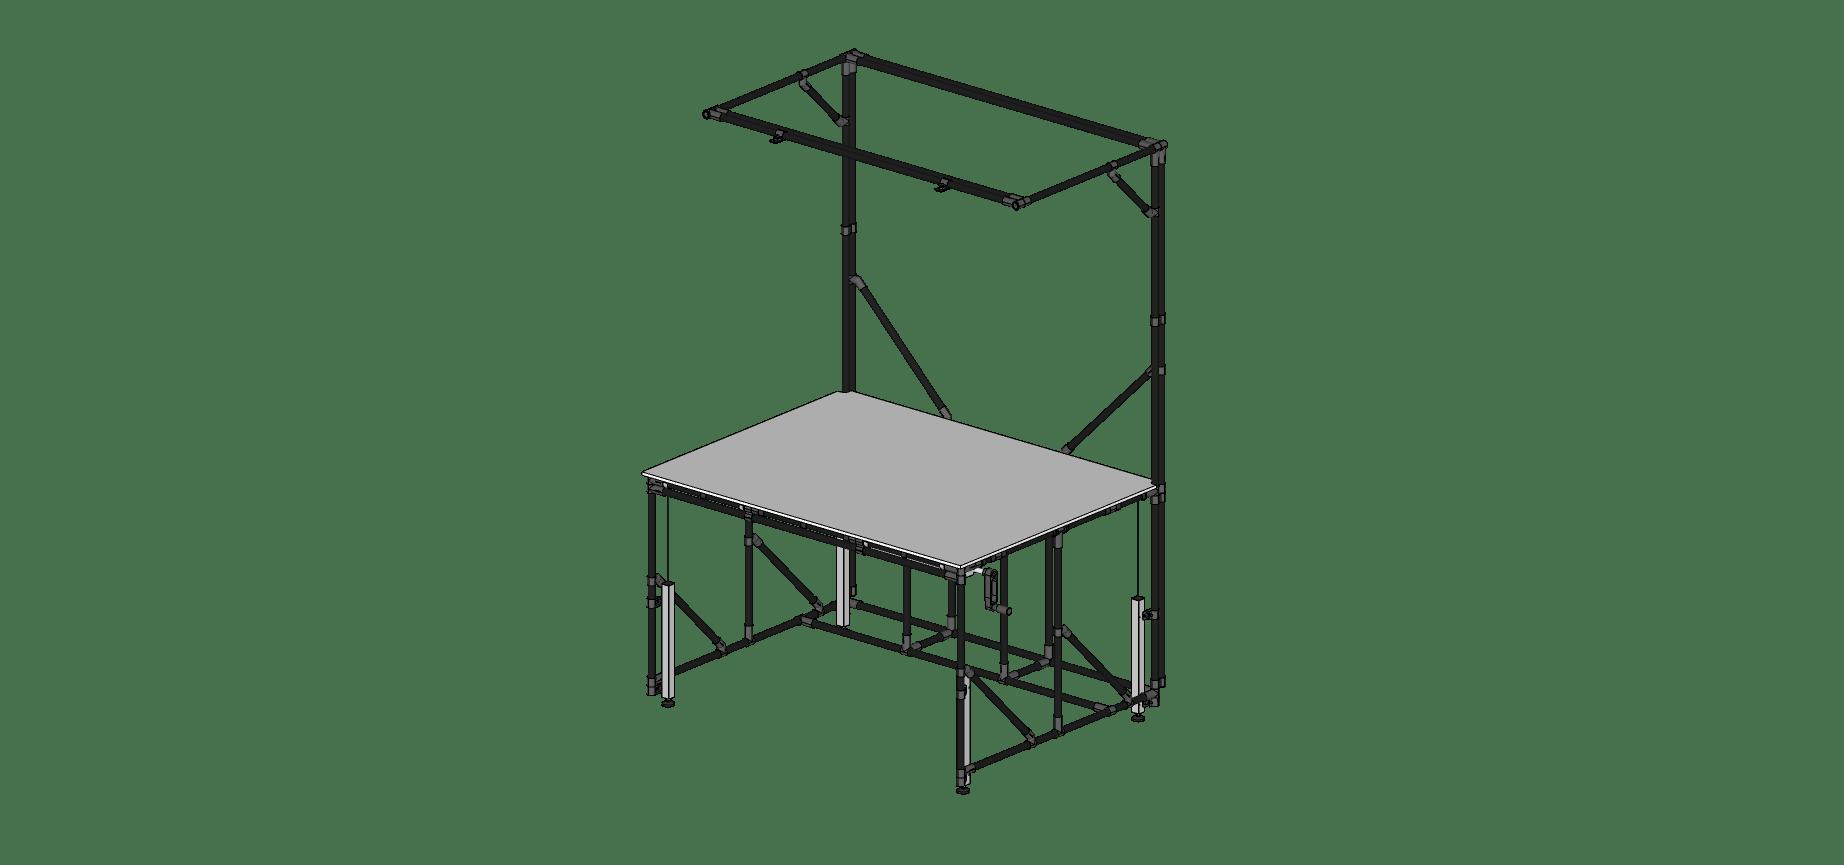 Reinforced Basic Workstation With Crank Kit